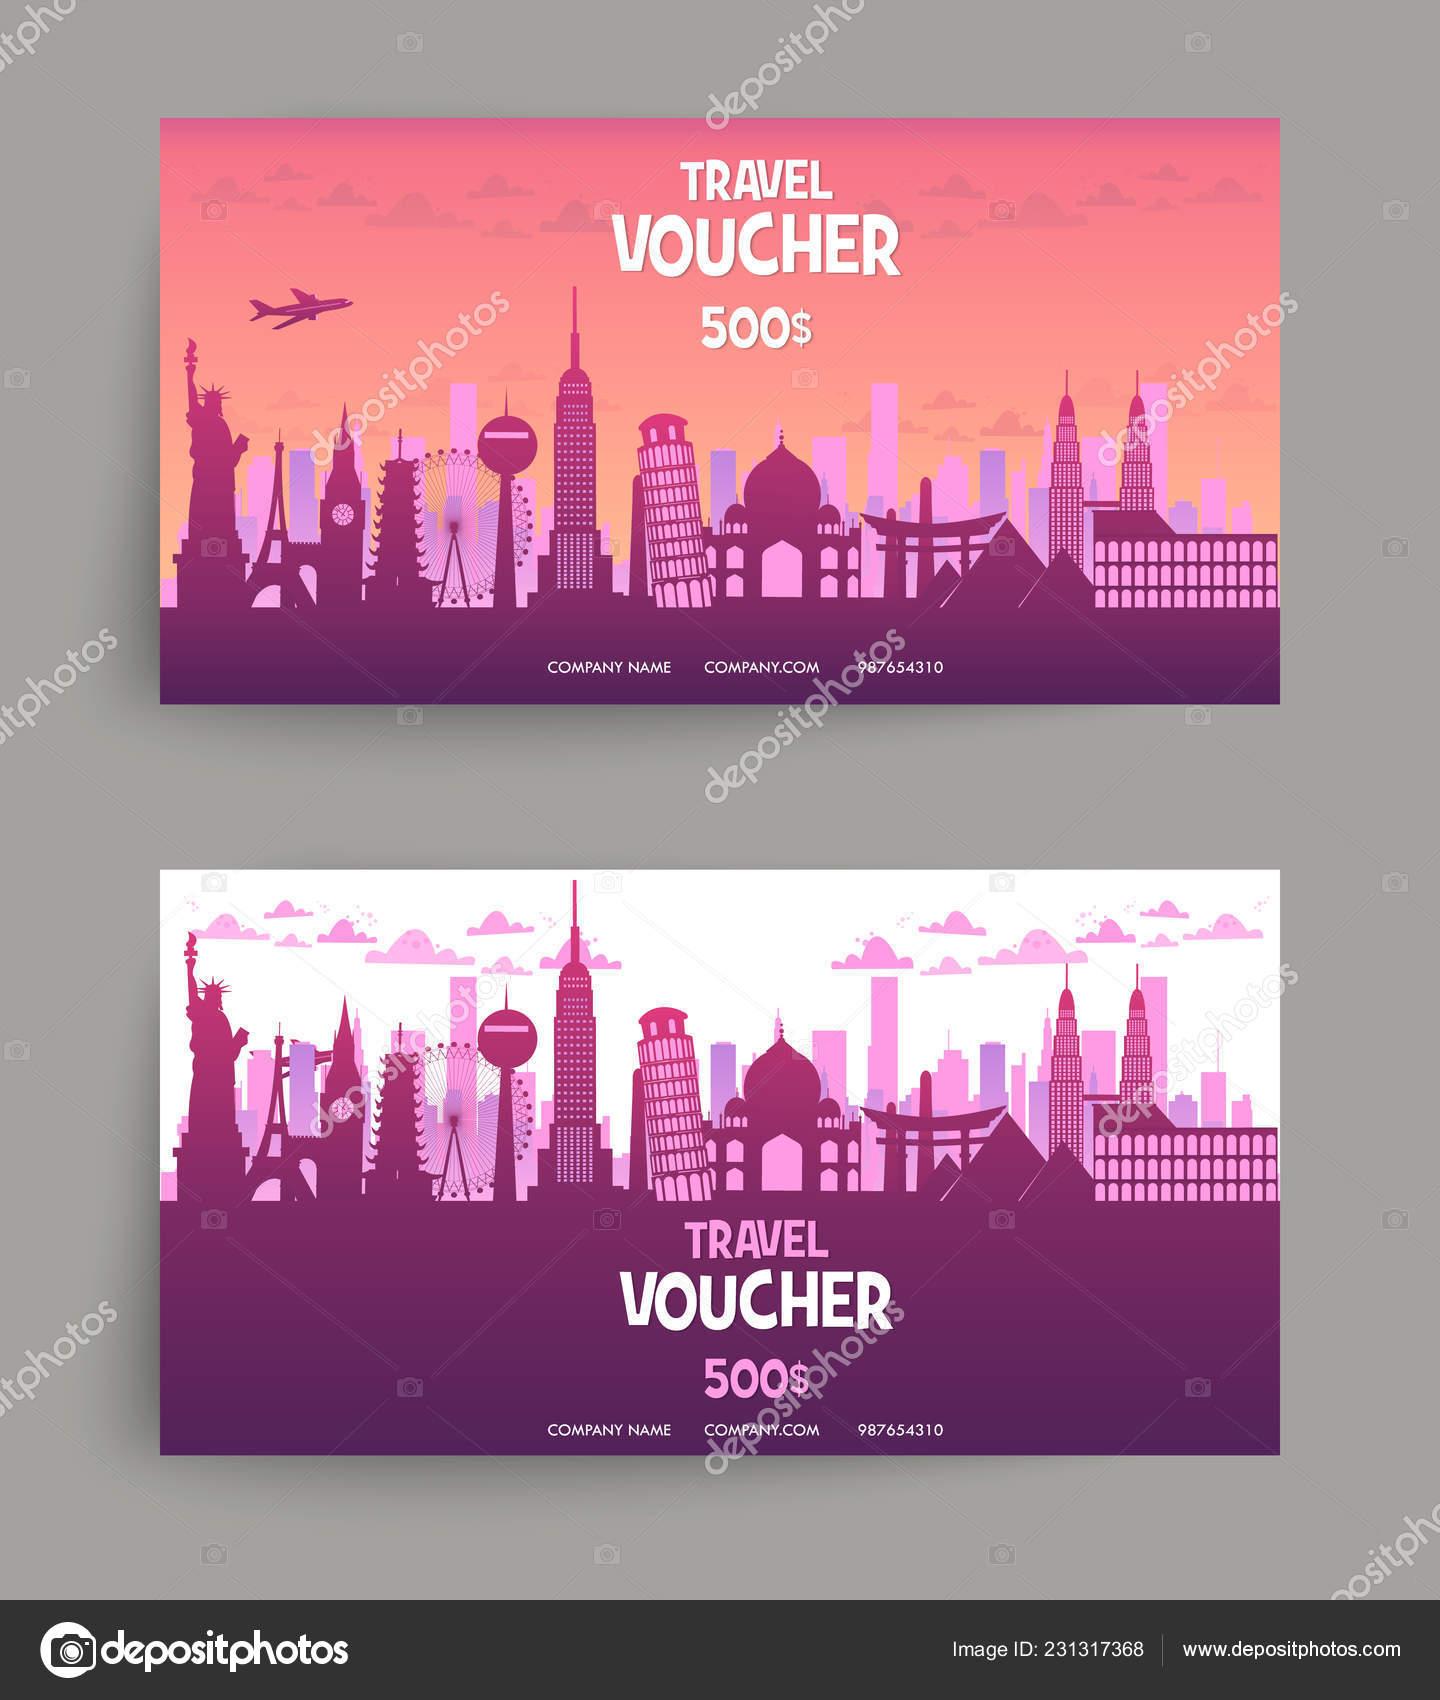 Vector Set Gift Travel Voucher Template Festive Gift Card Coupon